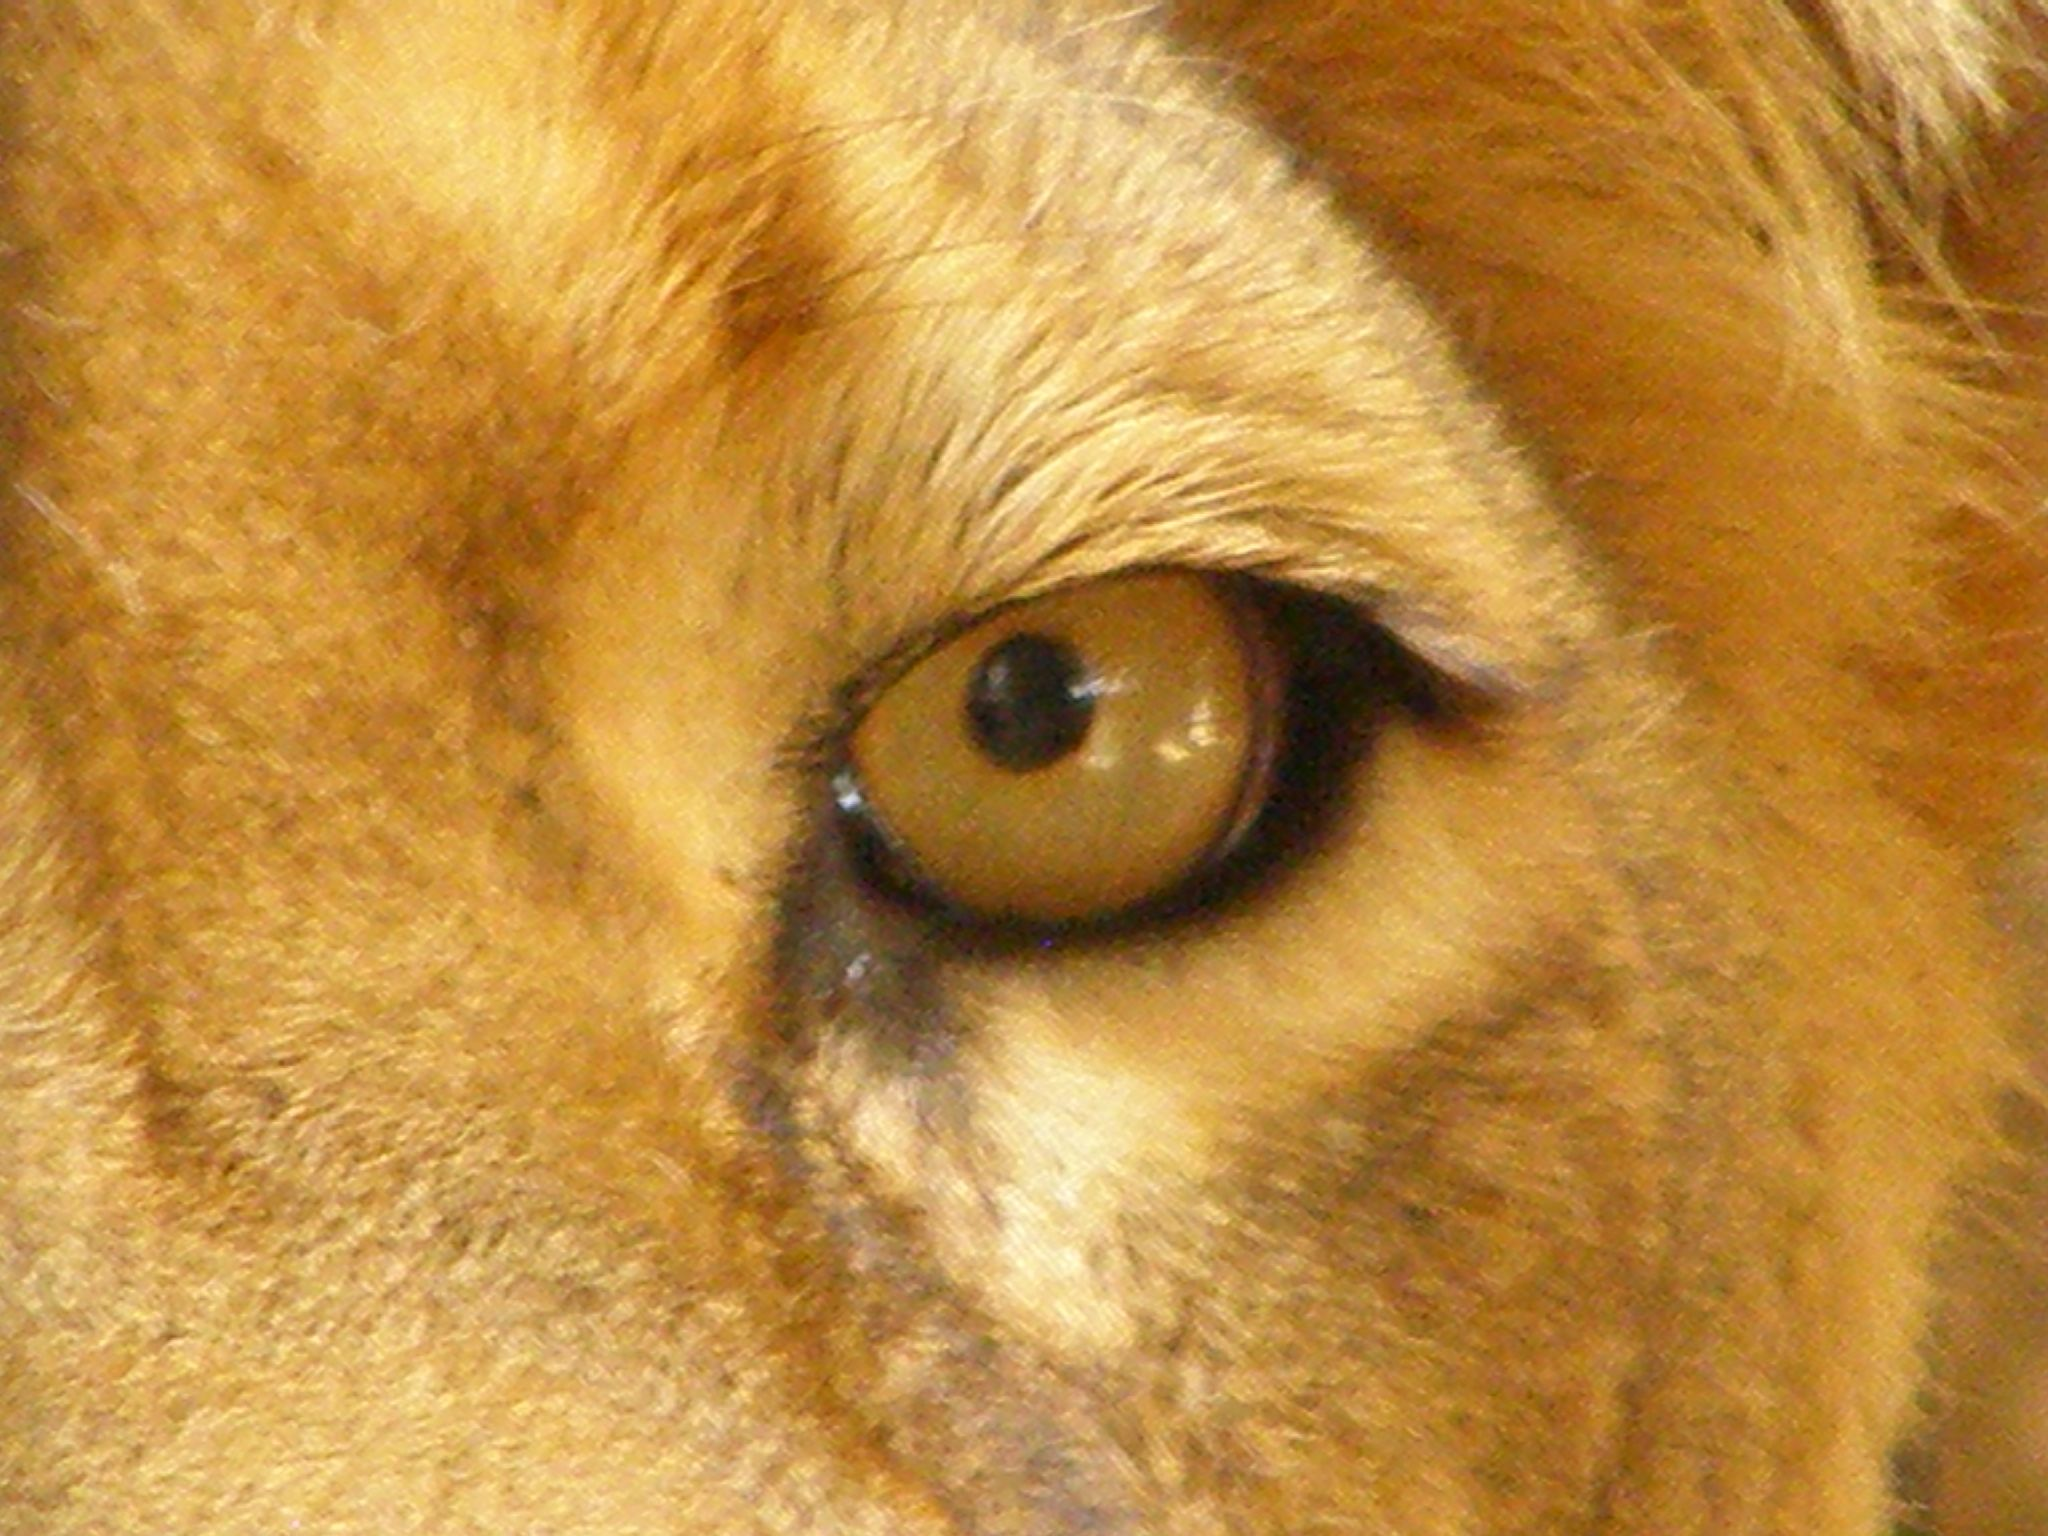 Popular Wallpaper Horse Lion - lion_panthera_leo_eye_close-up  Picture_58212.jpg